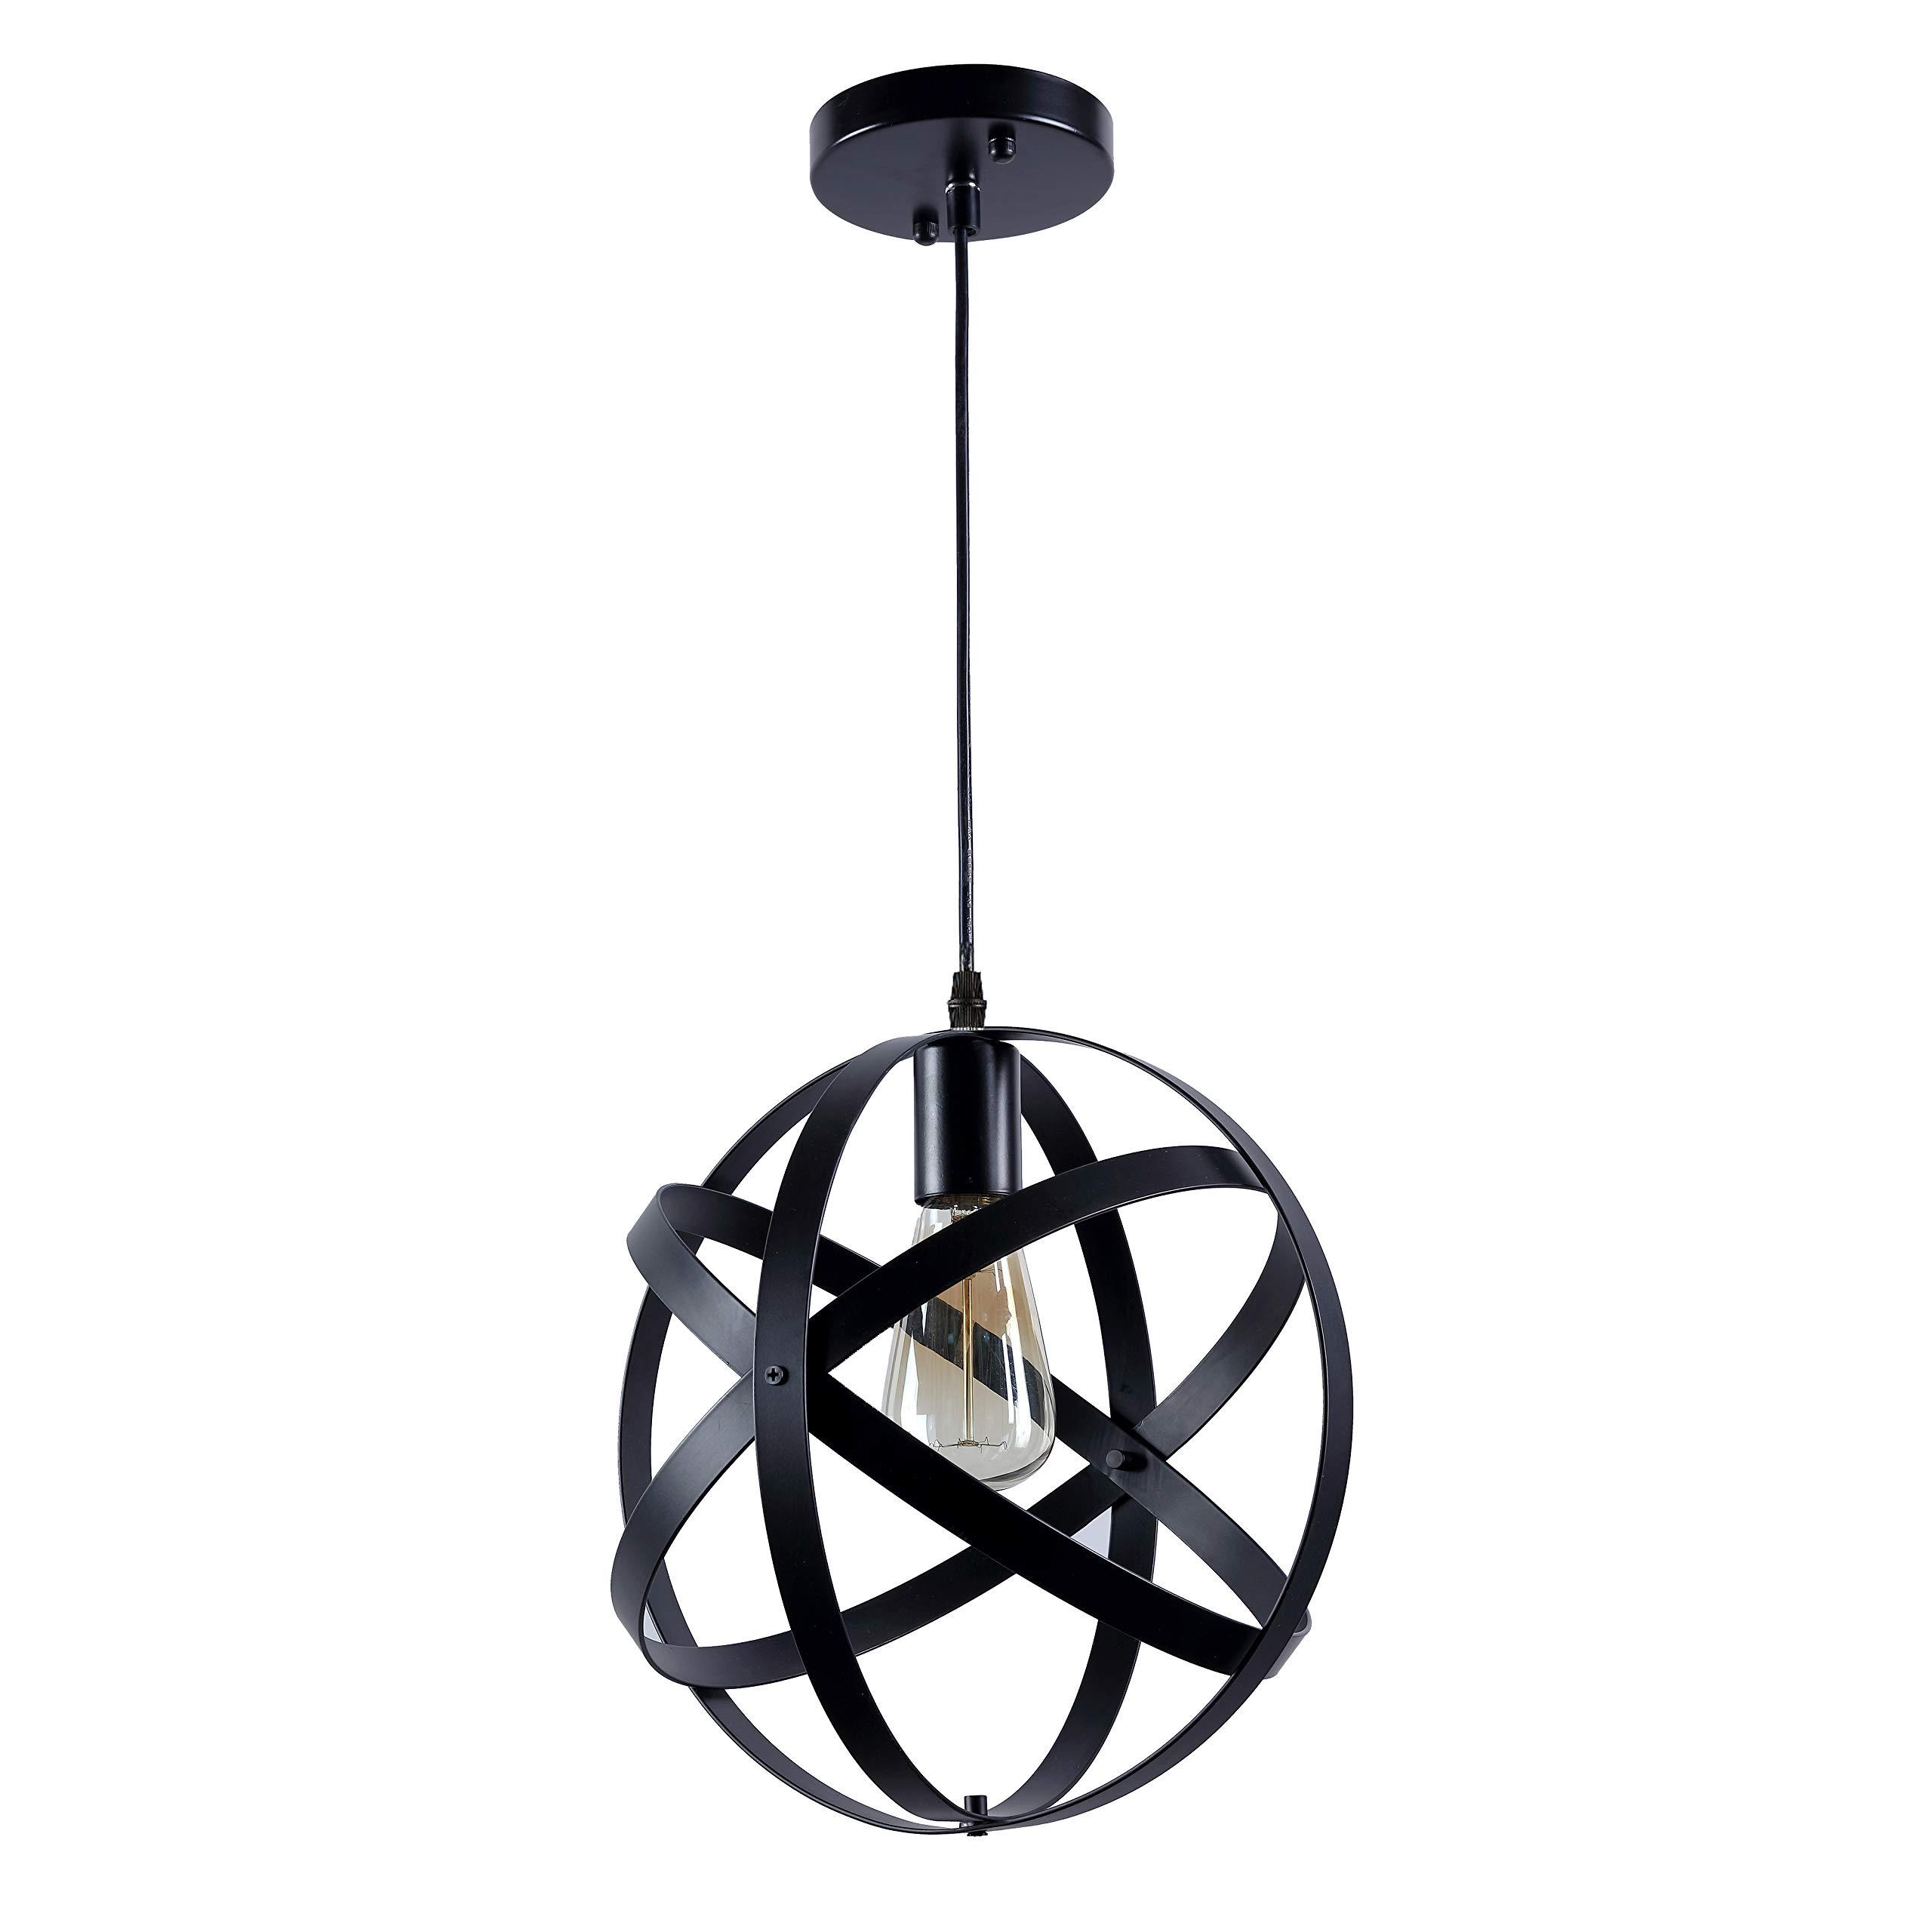 Rustic Industrial Metal Spherical Pendant Lighting Globe Edison Vintage Decorative Changeable Hanging Lighting Fixture for Kitchen Island Dining Table Bedroom Hallway